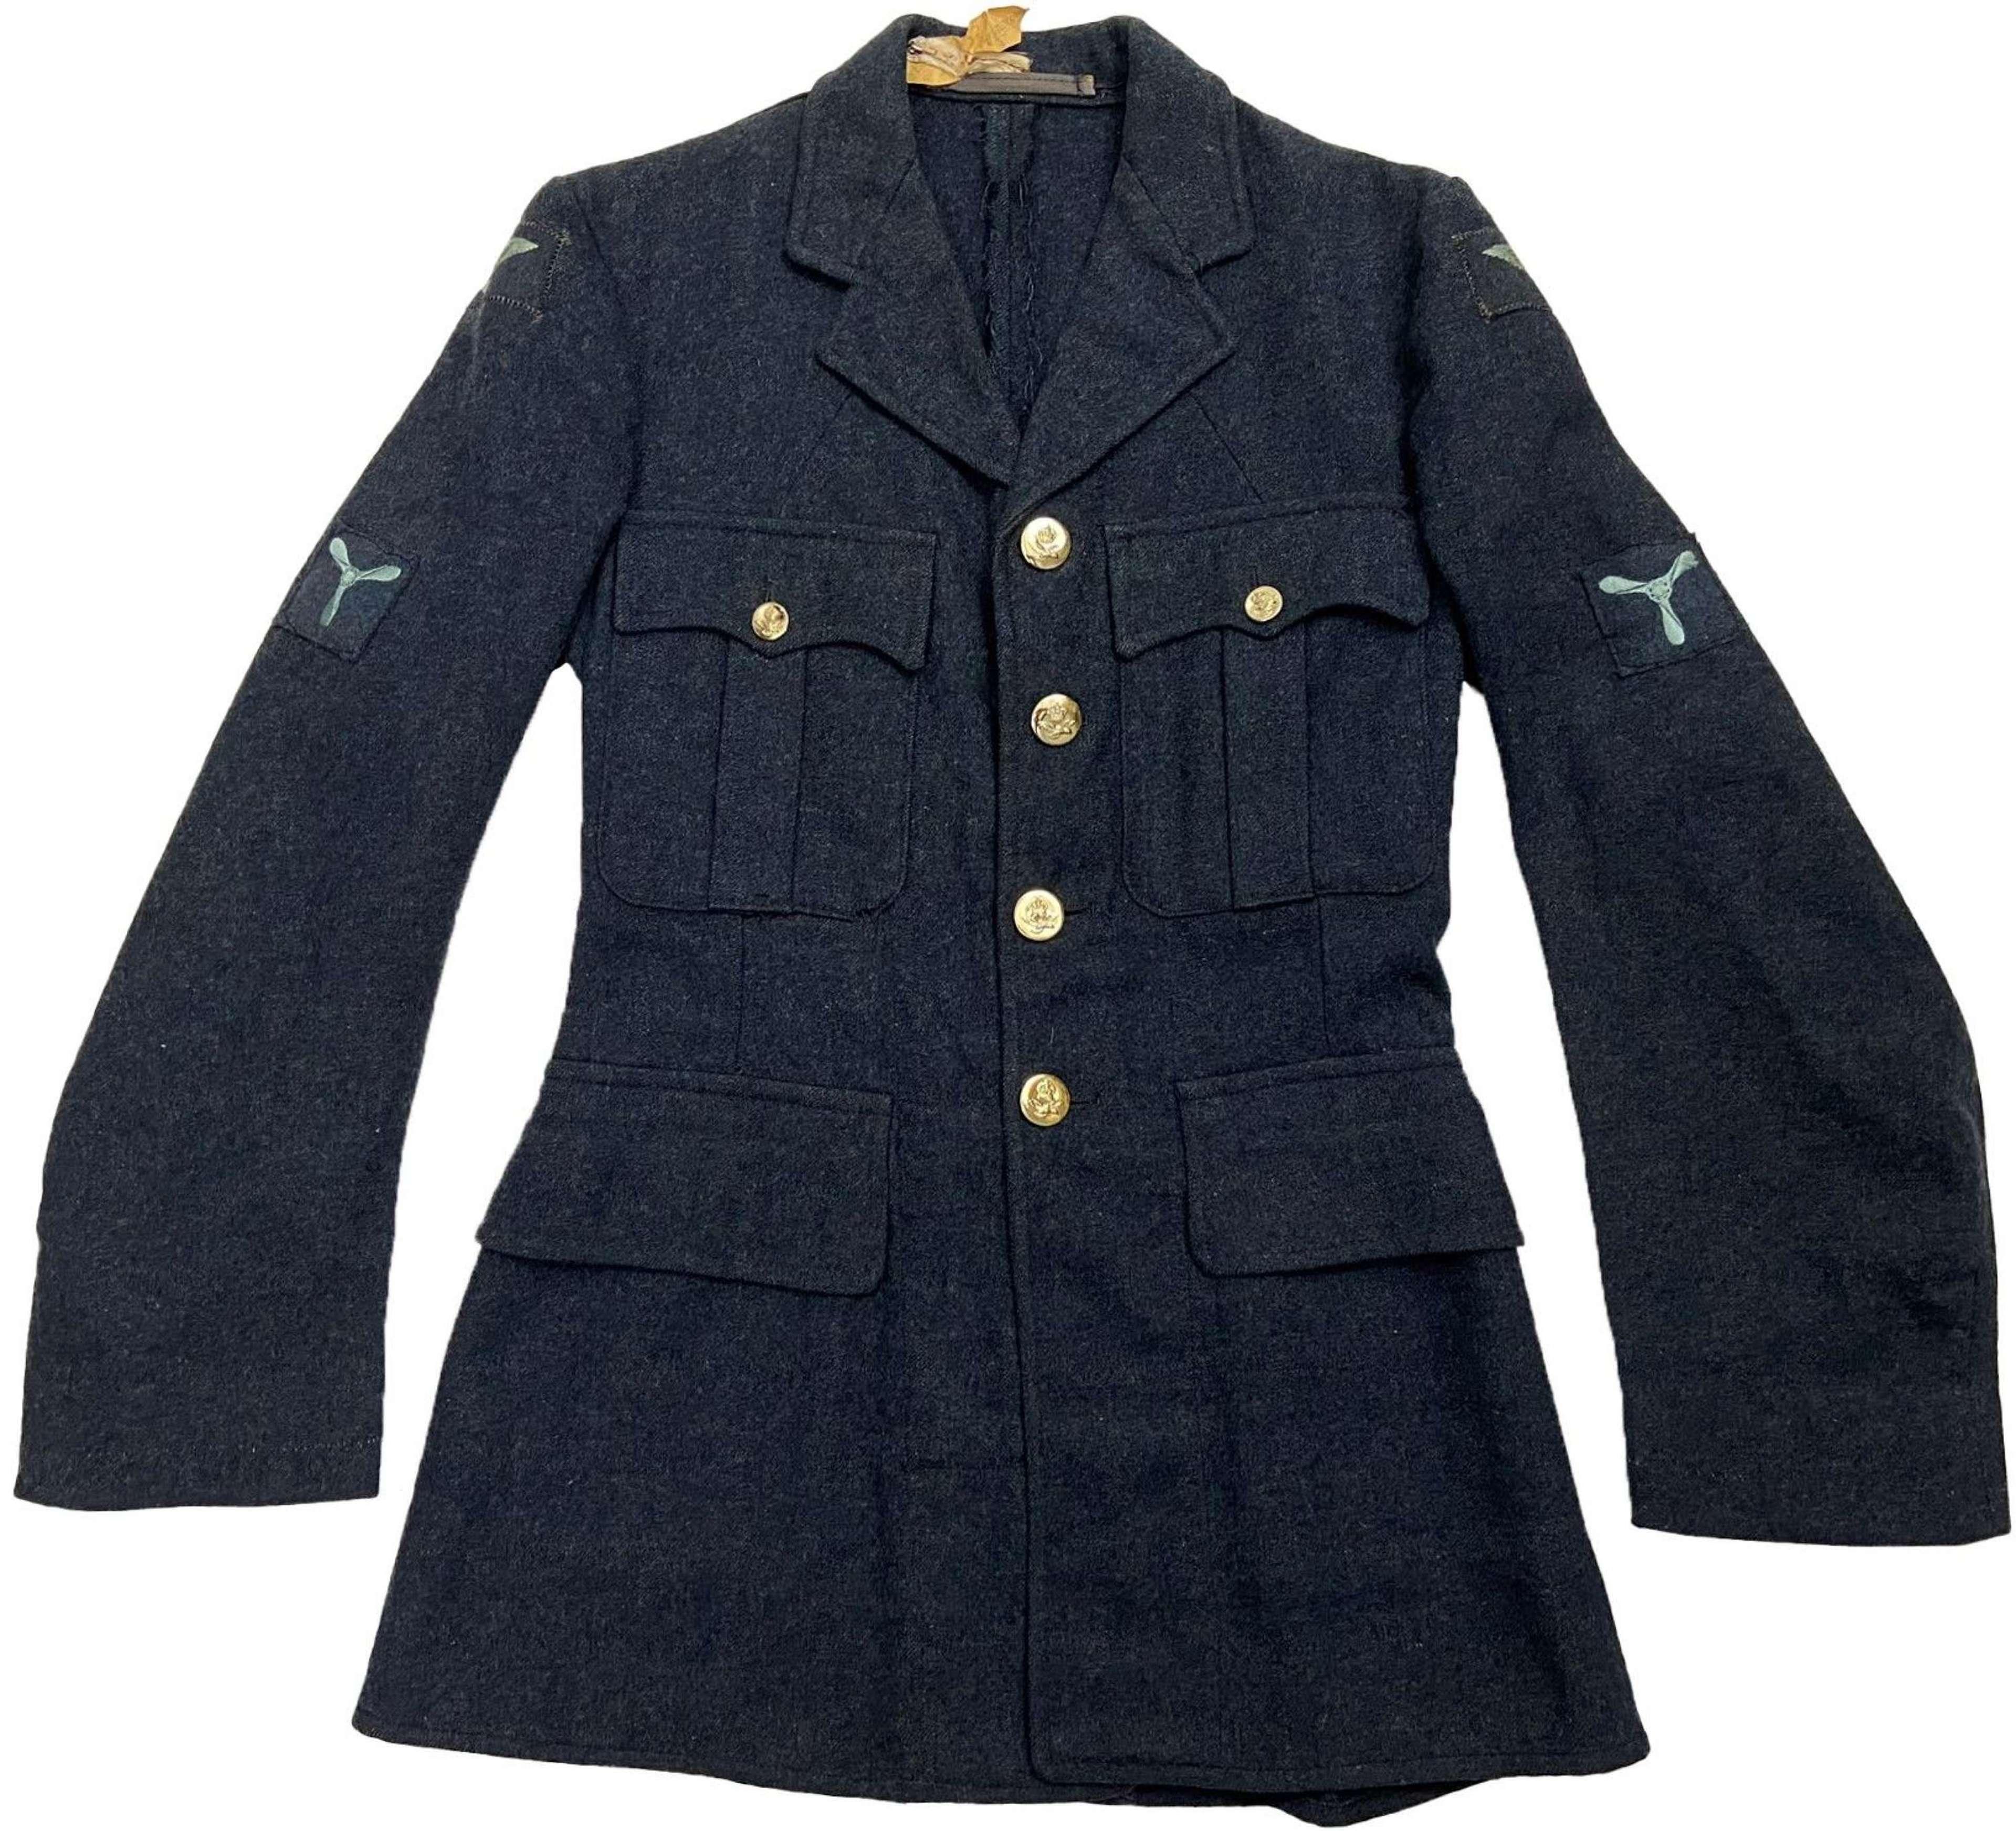 Original 1952 Dated RAF Ordinary Airman's Tunic - Size 13